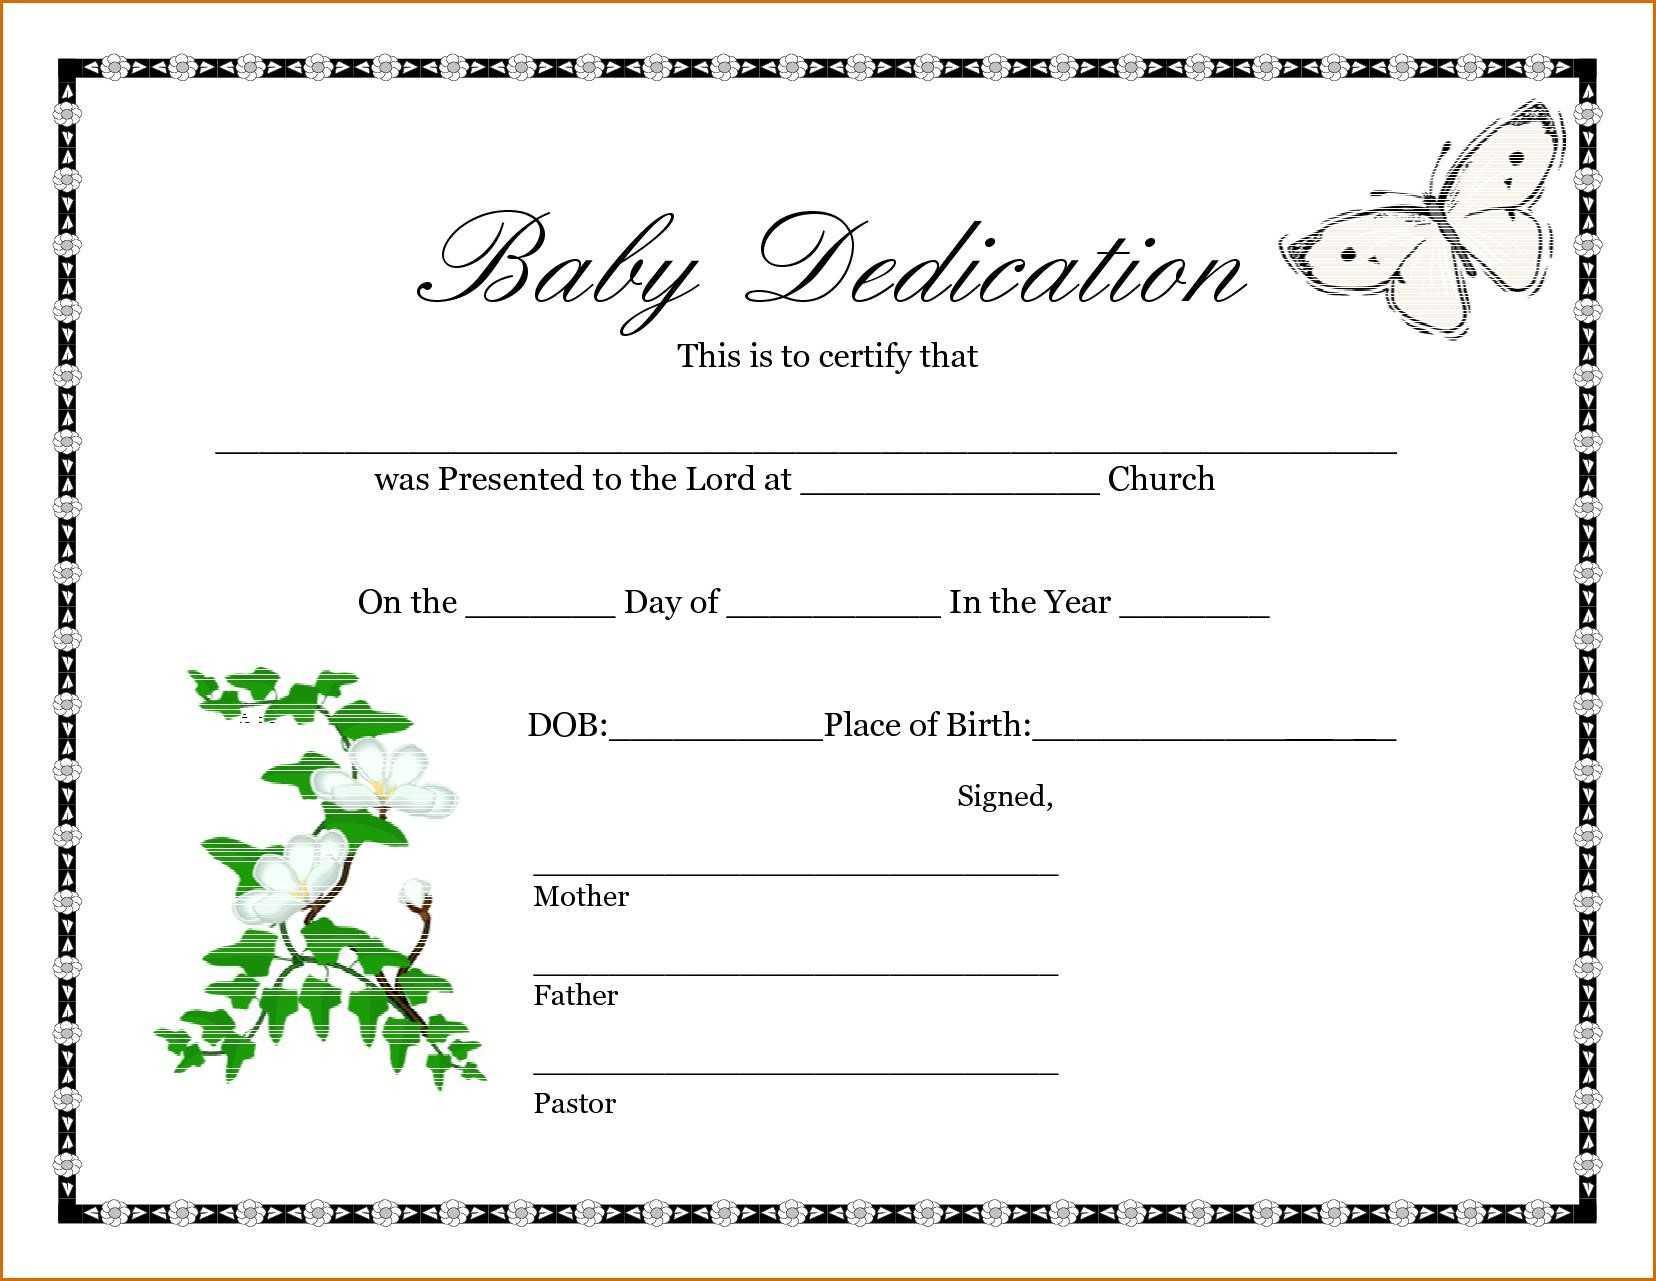 028 Baby Dedication Certificate Template Fake Birth Maker In Fake Birth Certificate Template